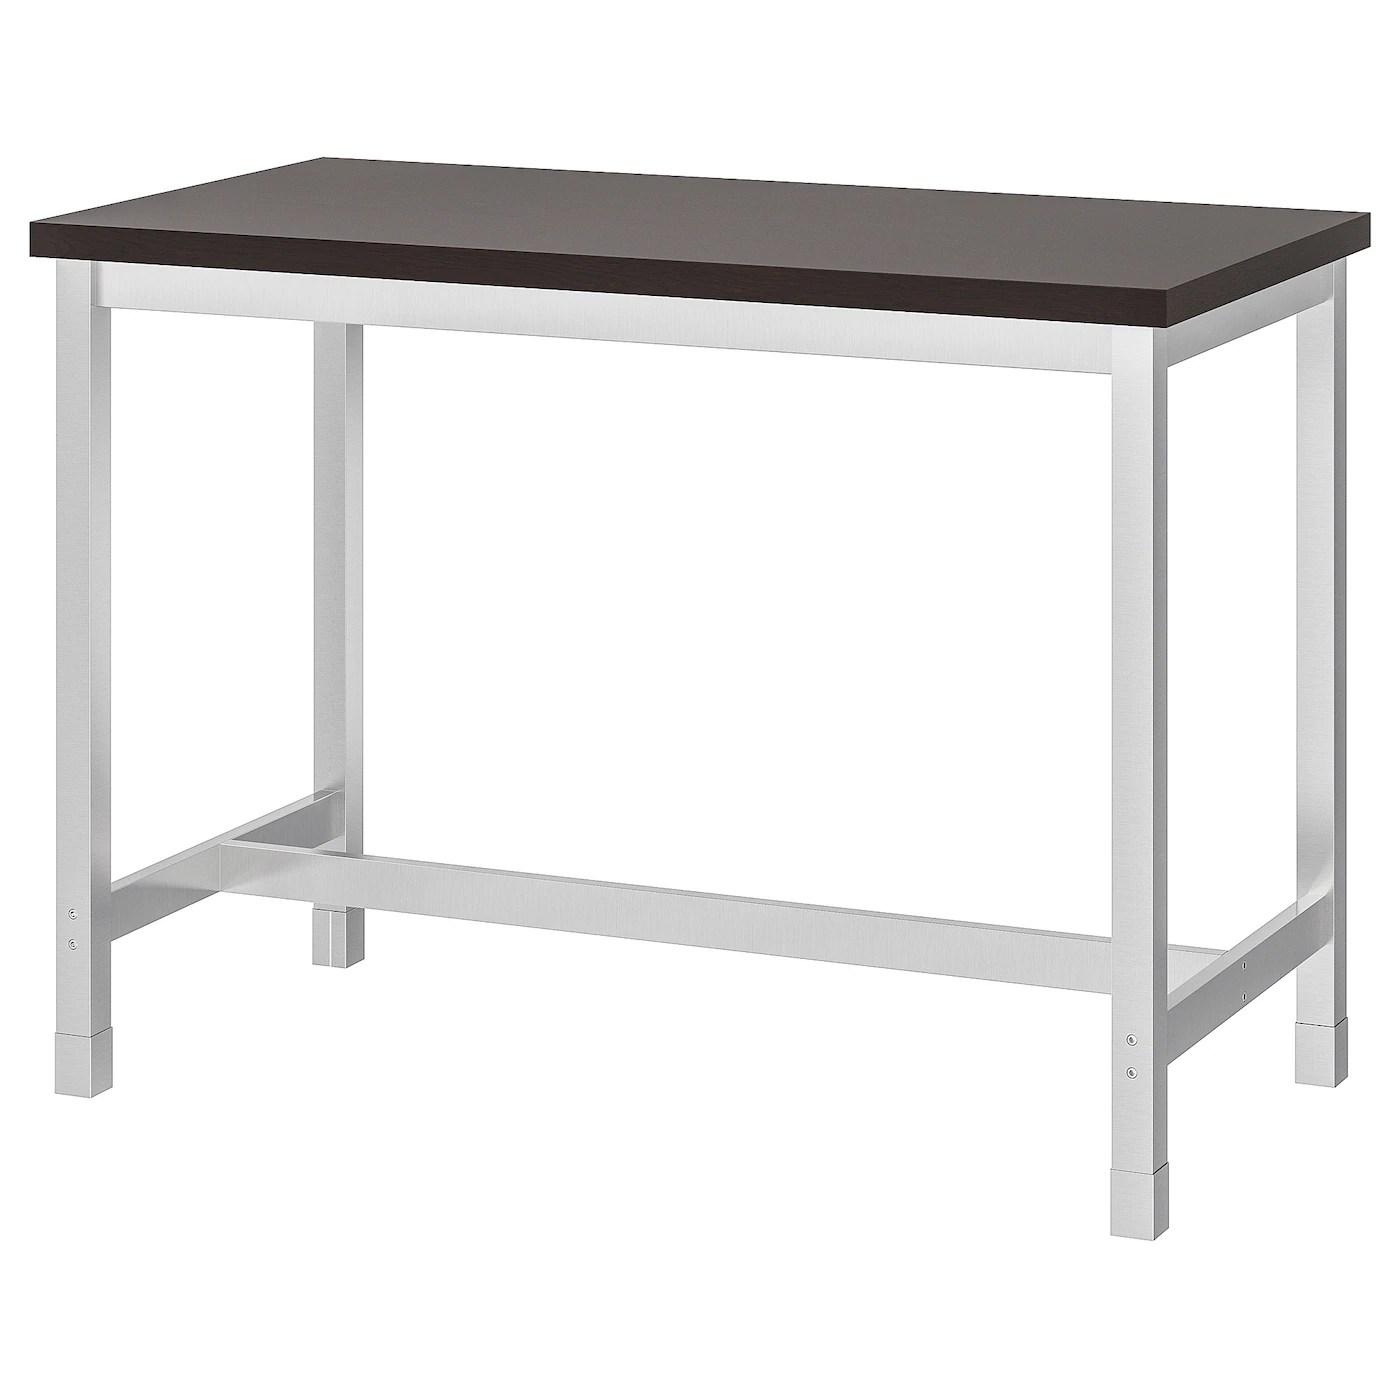 utby table de bar brun noir acier inoxydable 120x60x90 cm